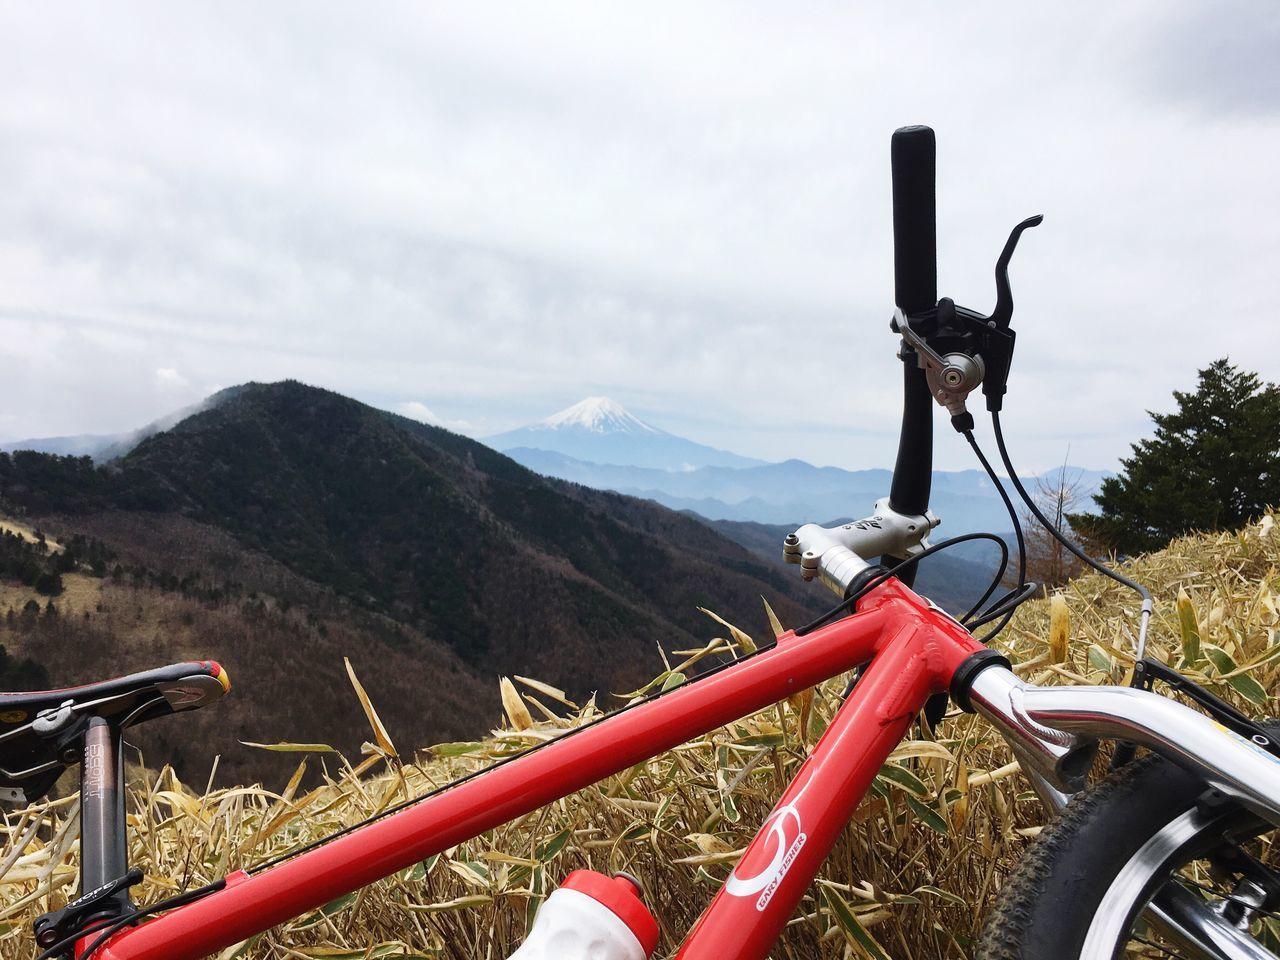 Mountain Bicycle Outdoors Nature Landscape Mountain Range Mountain Bike Bike Garyfisher